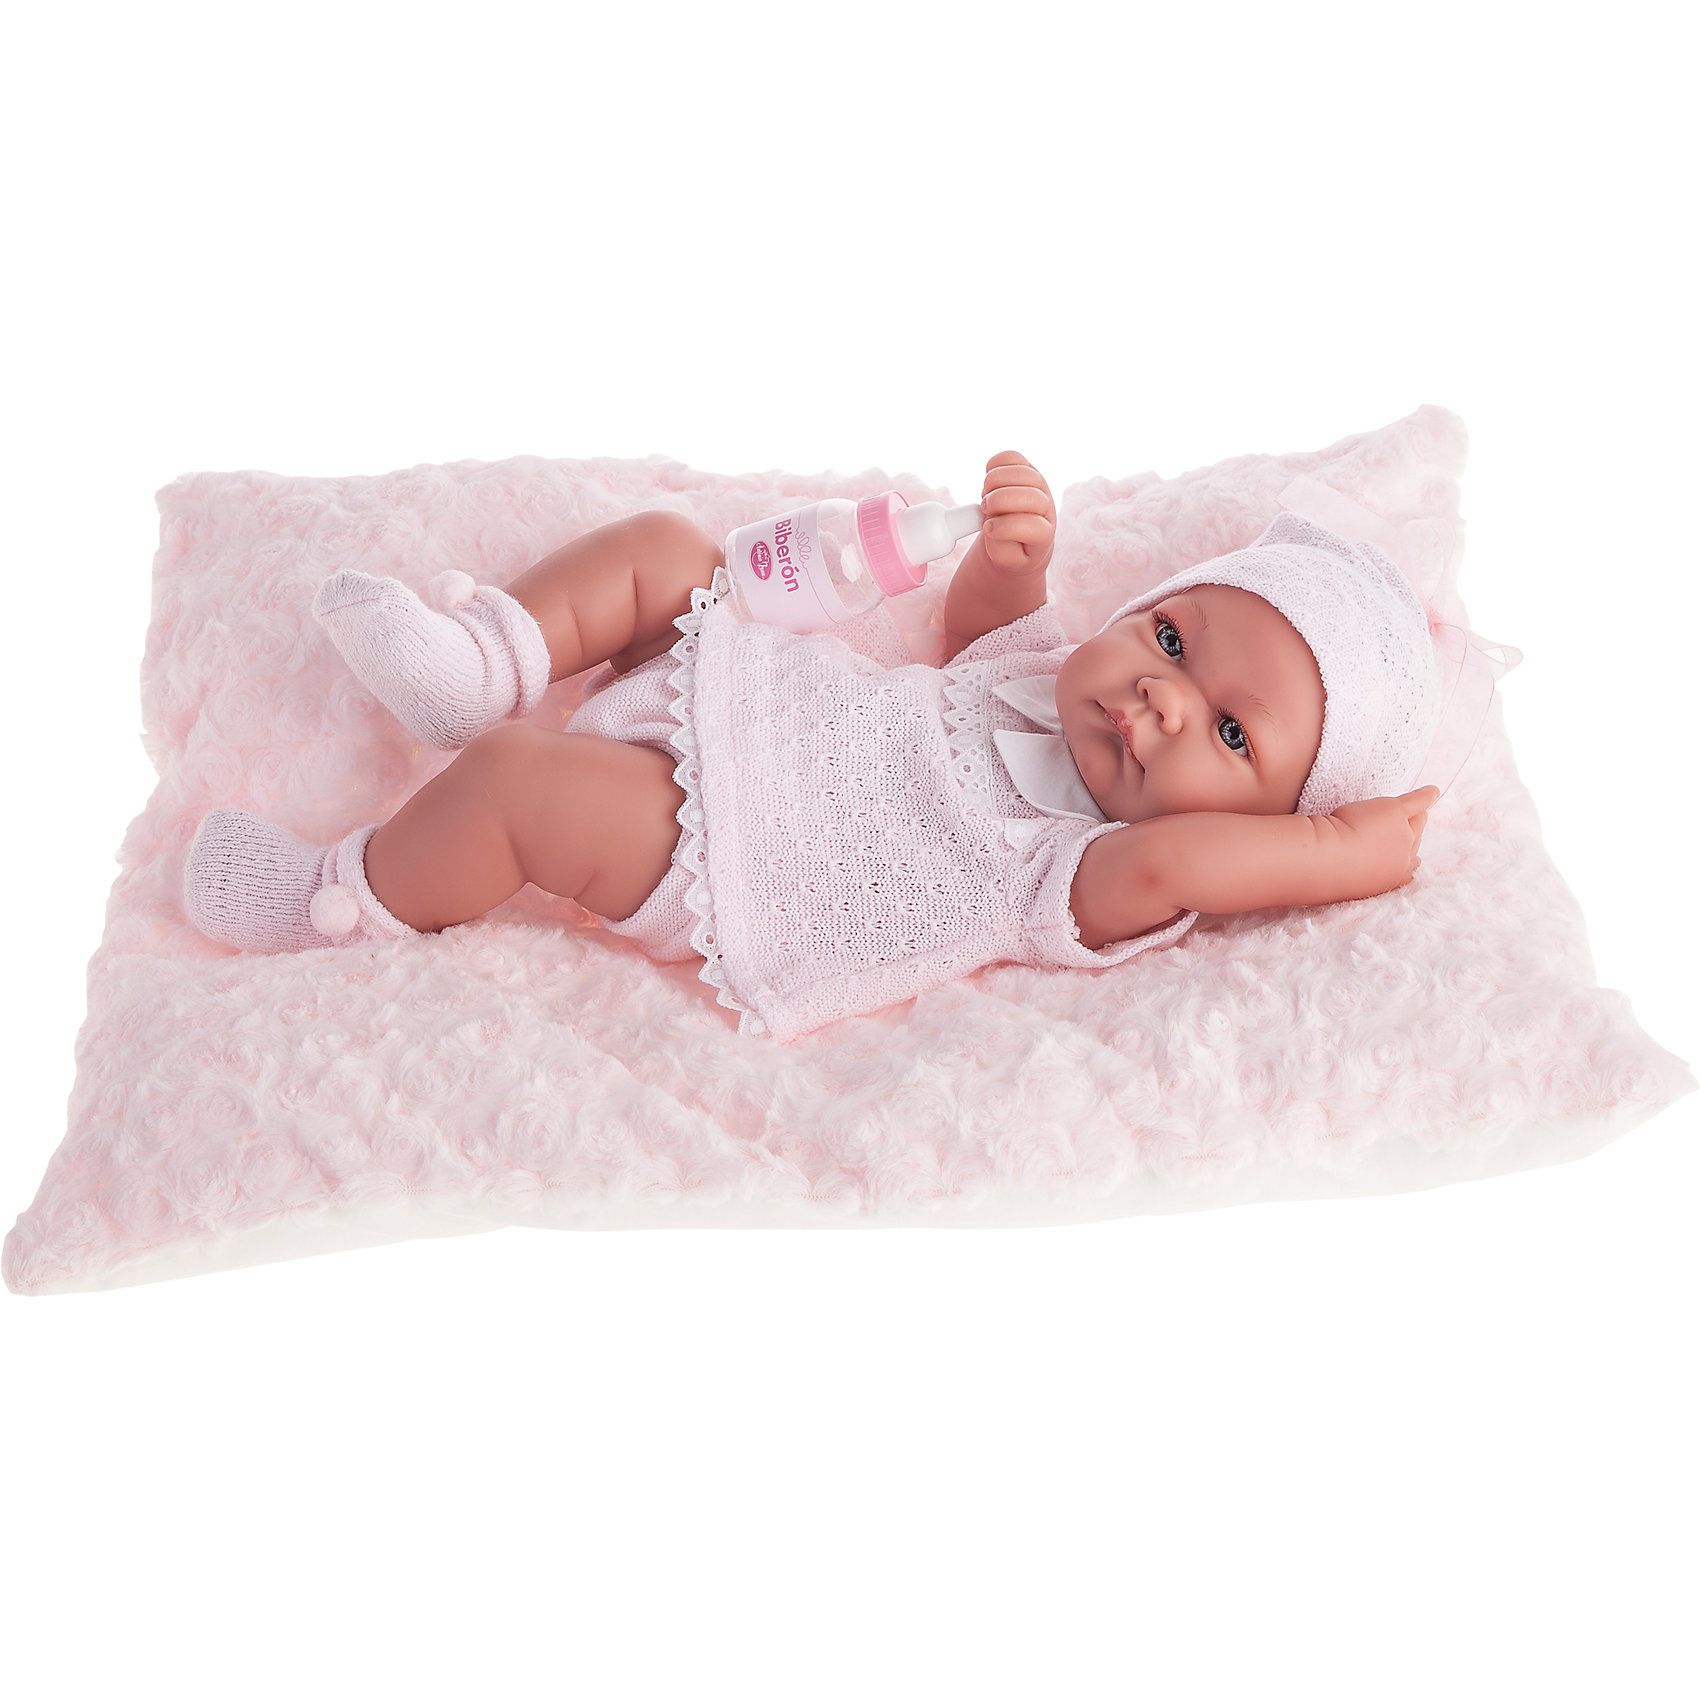 Munecas Antonio Juan Кукла-младенец Ника в розовом, 42 см, Munecas Antonio Juan